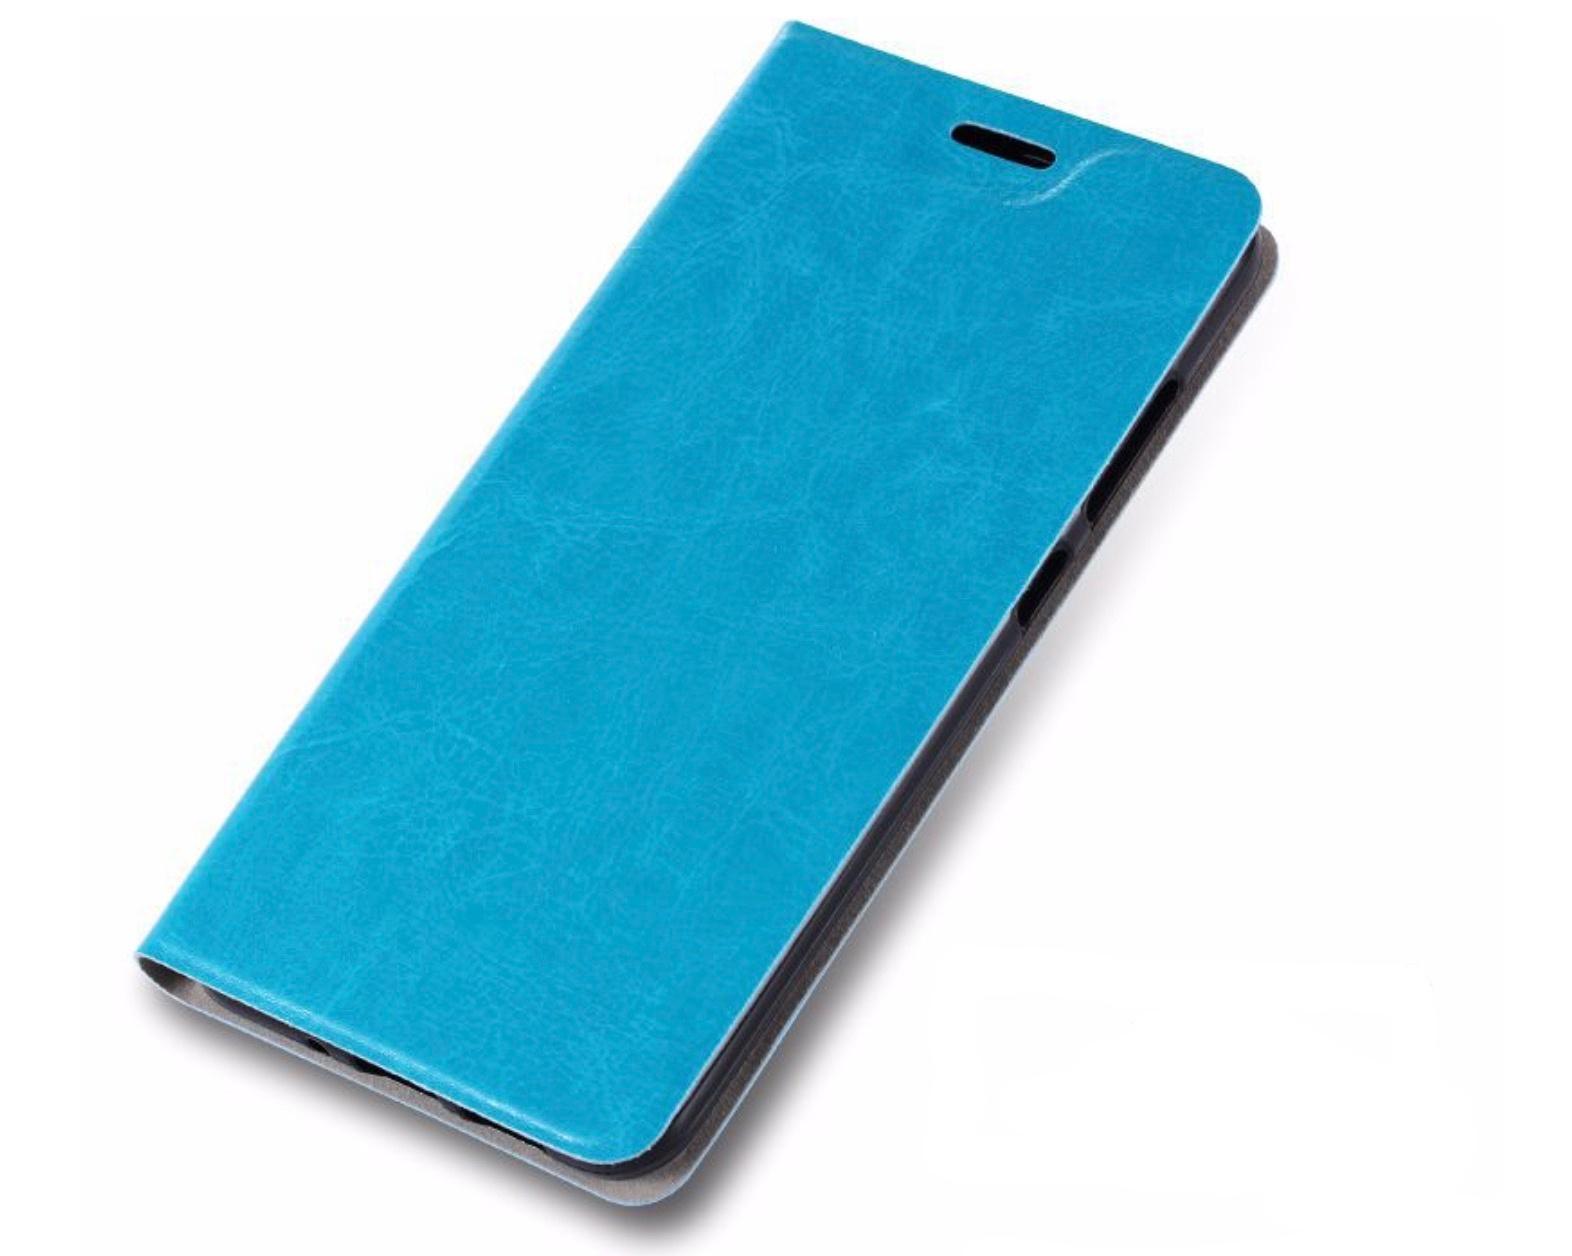 Чехол-книжка MyPads для Microsoft Lumia 640 XL на жёсткой металлической основе бирюзовый цена и фото